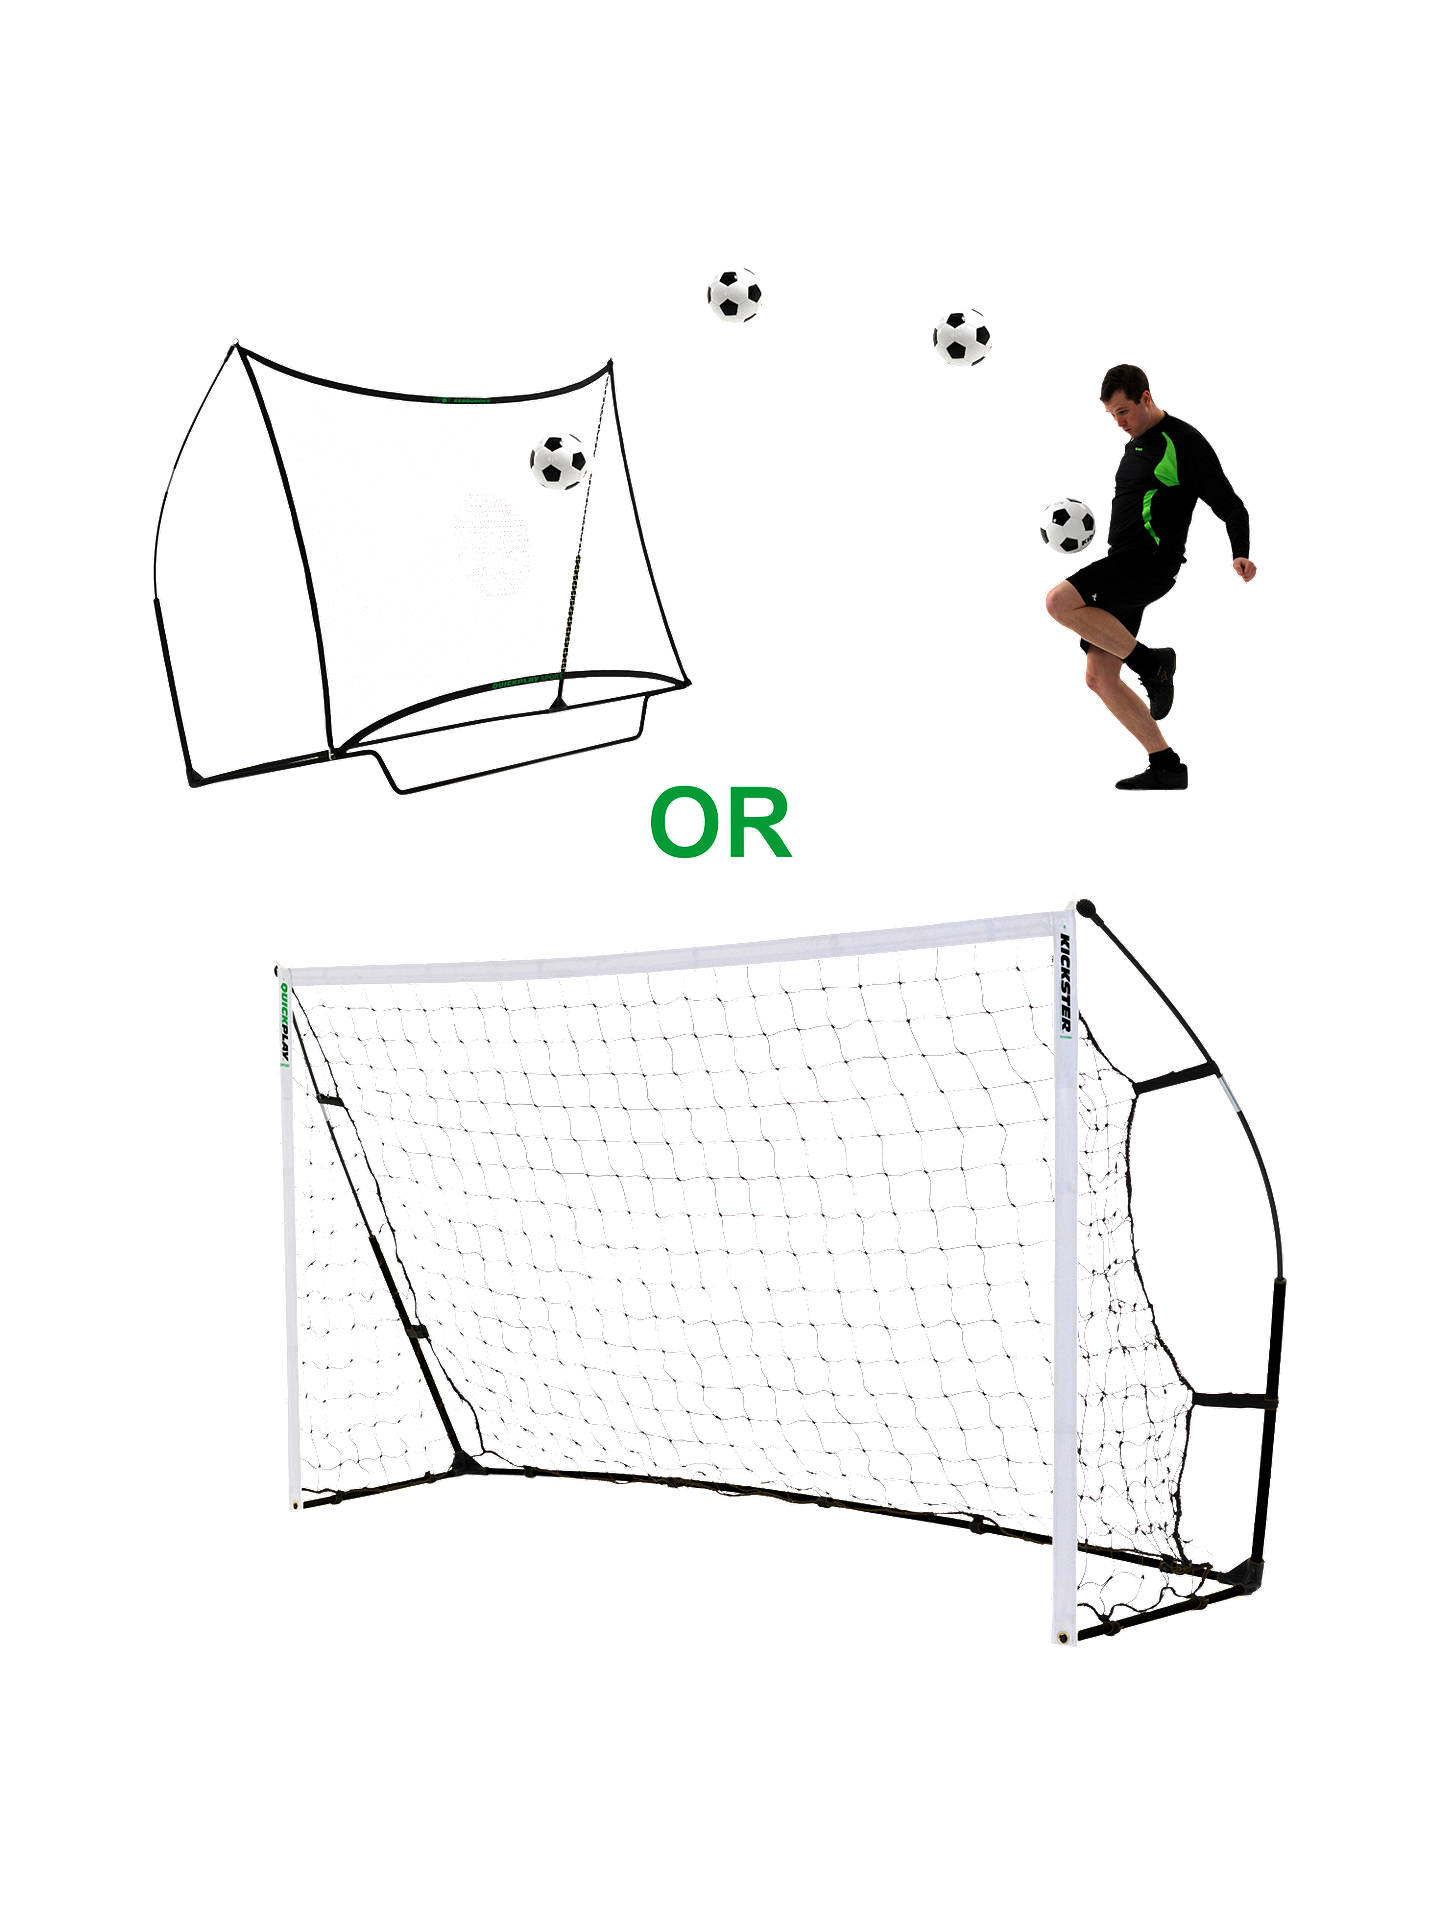 QuickPlay Kickster Ultra-Portable Combo 8' x 5' Goal or